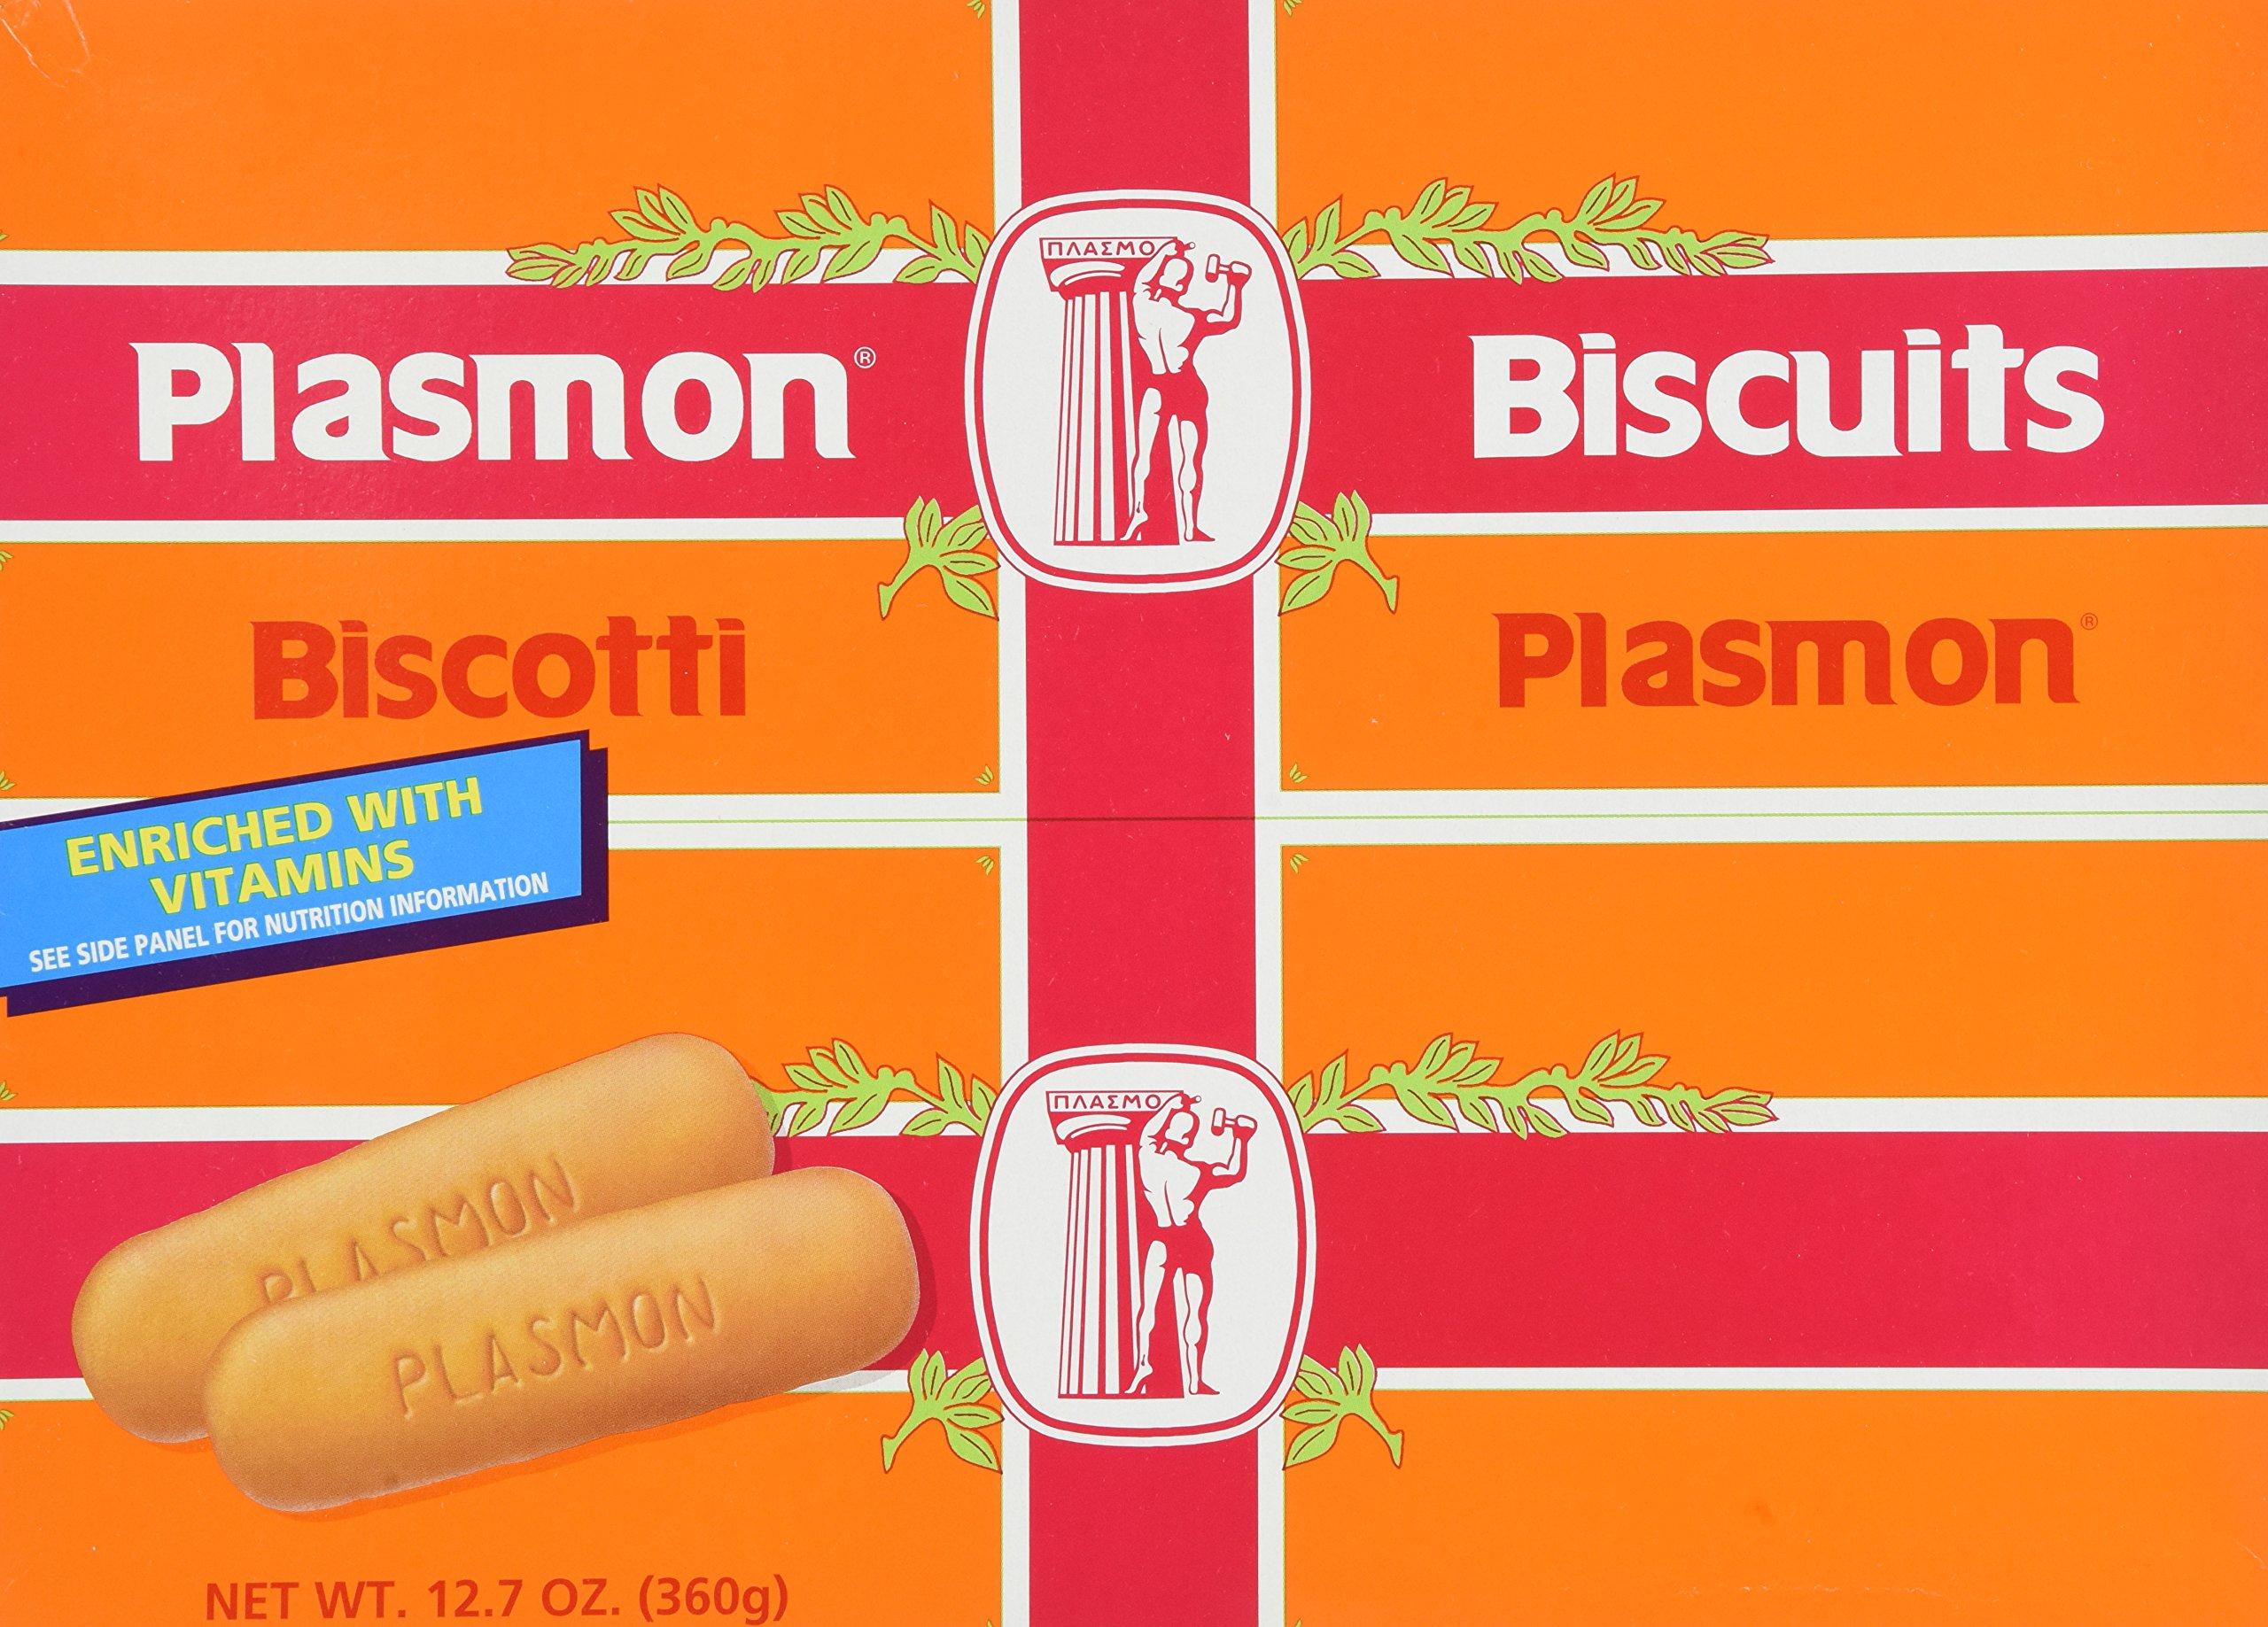 Plasmon - Italian Baby Biscuits (Biscotti), (2)- 12.7 oz. Boxes